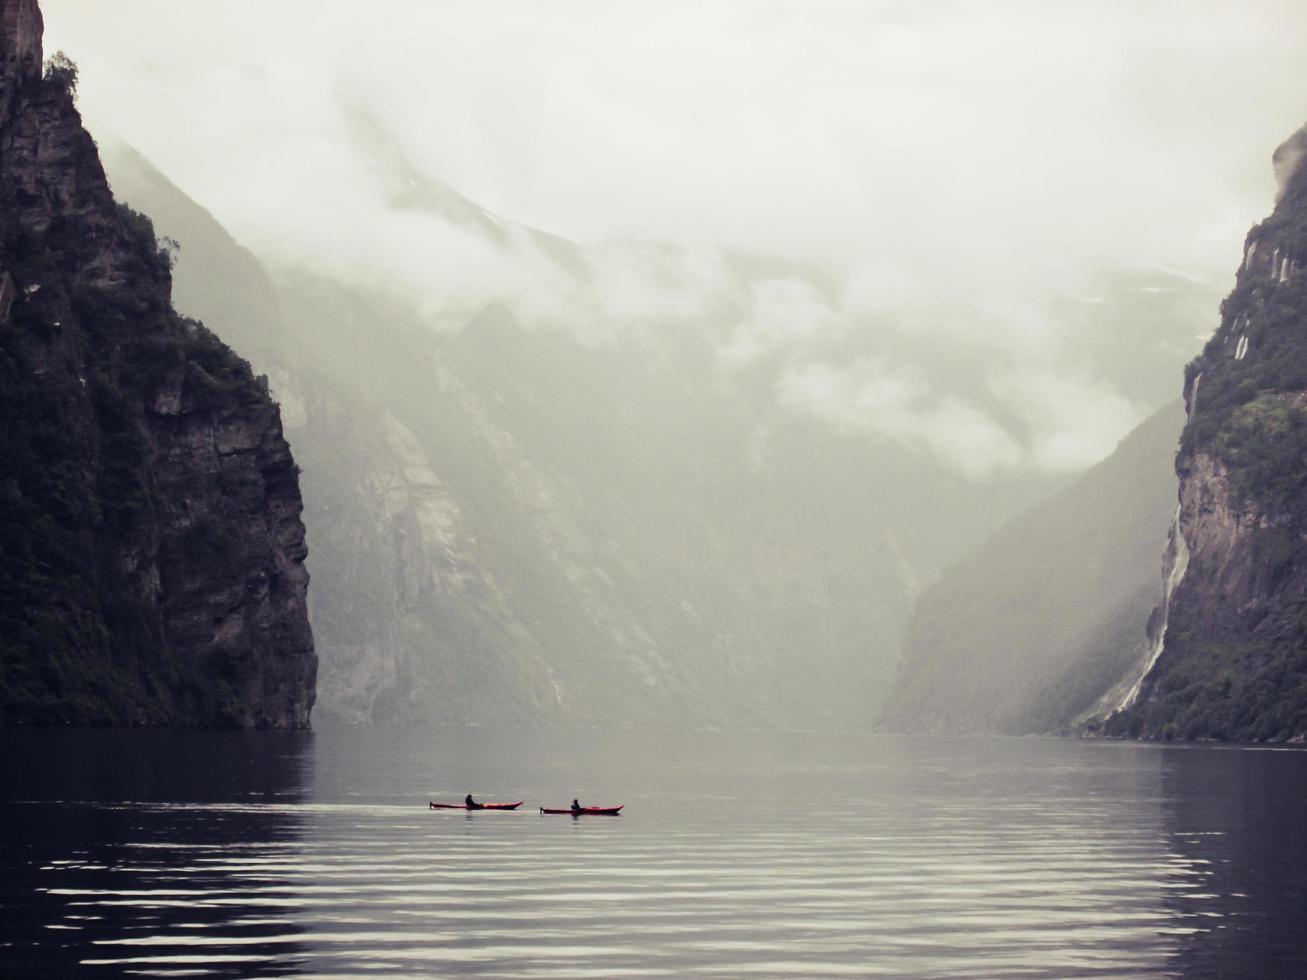 vista panoramica di due kayakisti nel lago di Norvegia foto